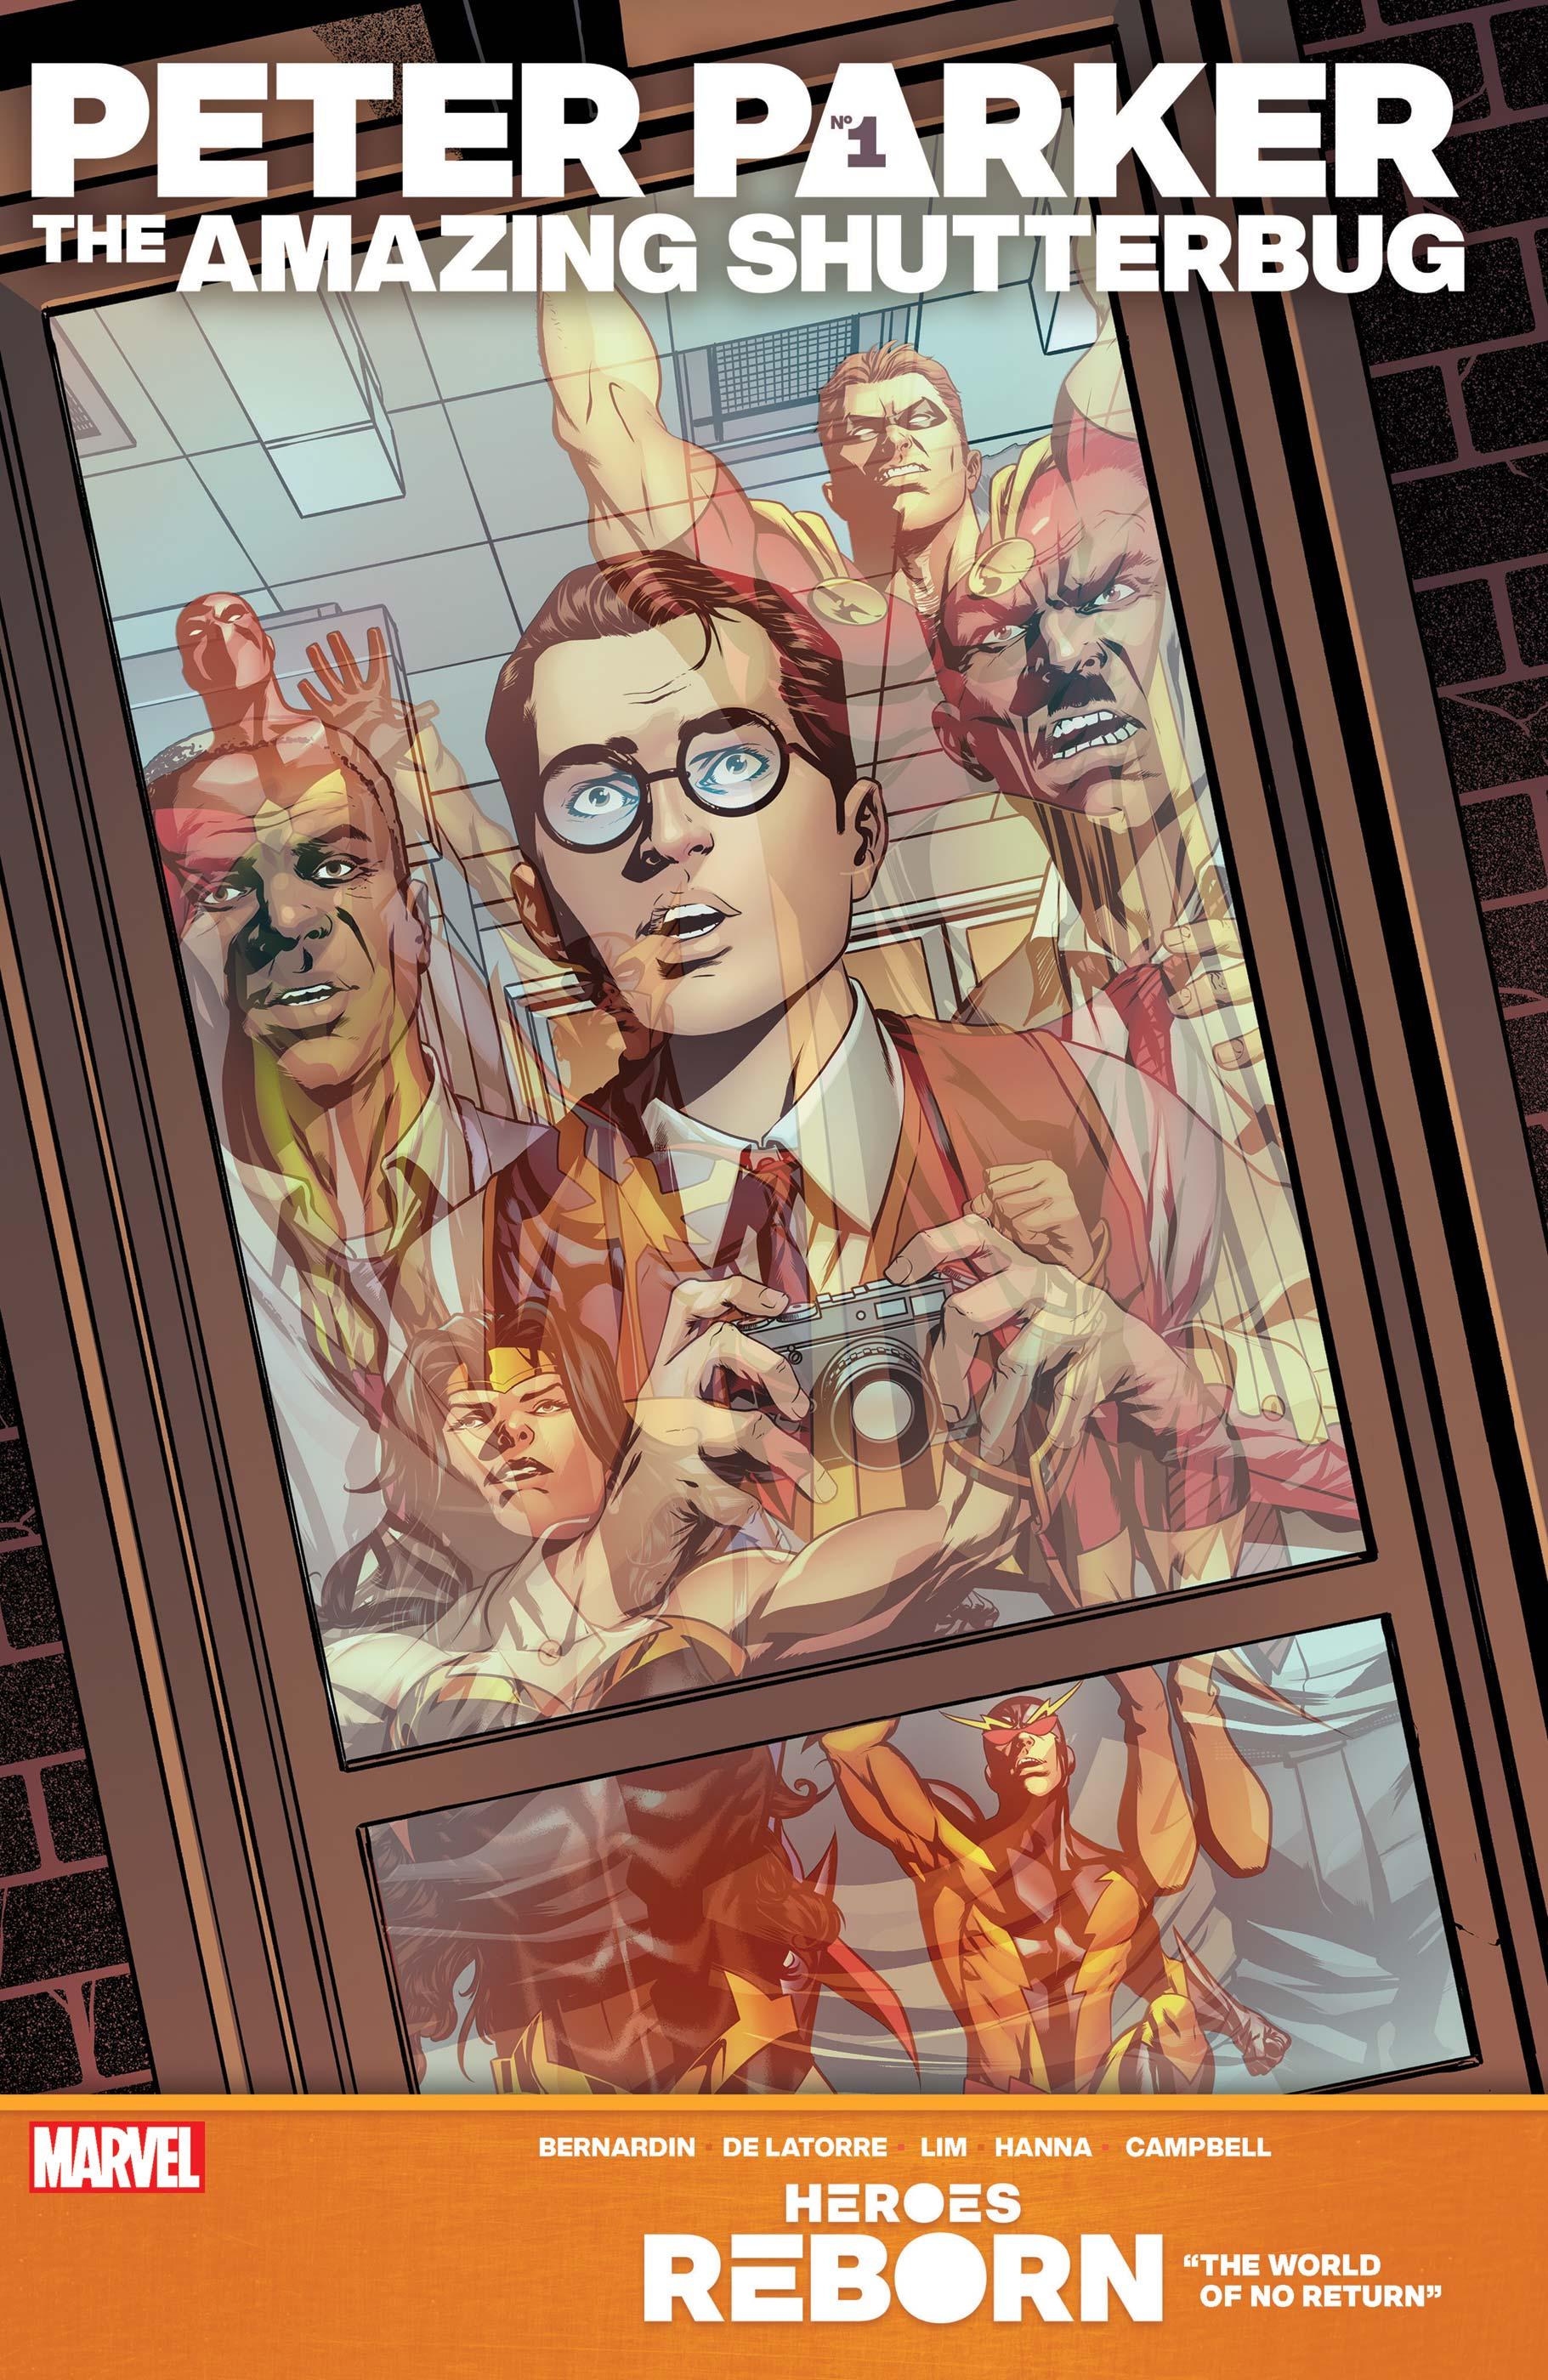 Heroes Reborn: Peter Parker, The Amazing Shutterbug (2021) #1